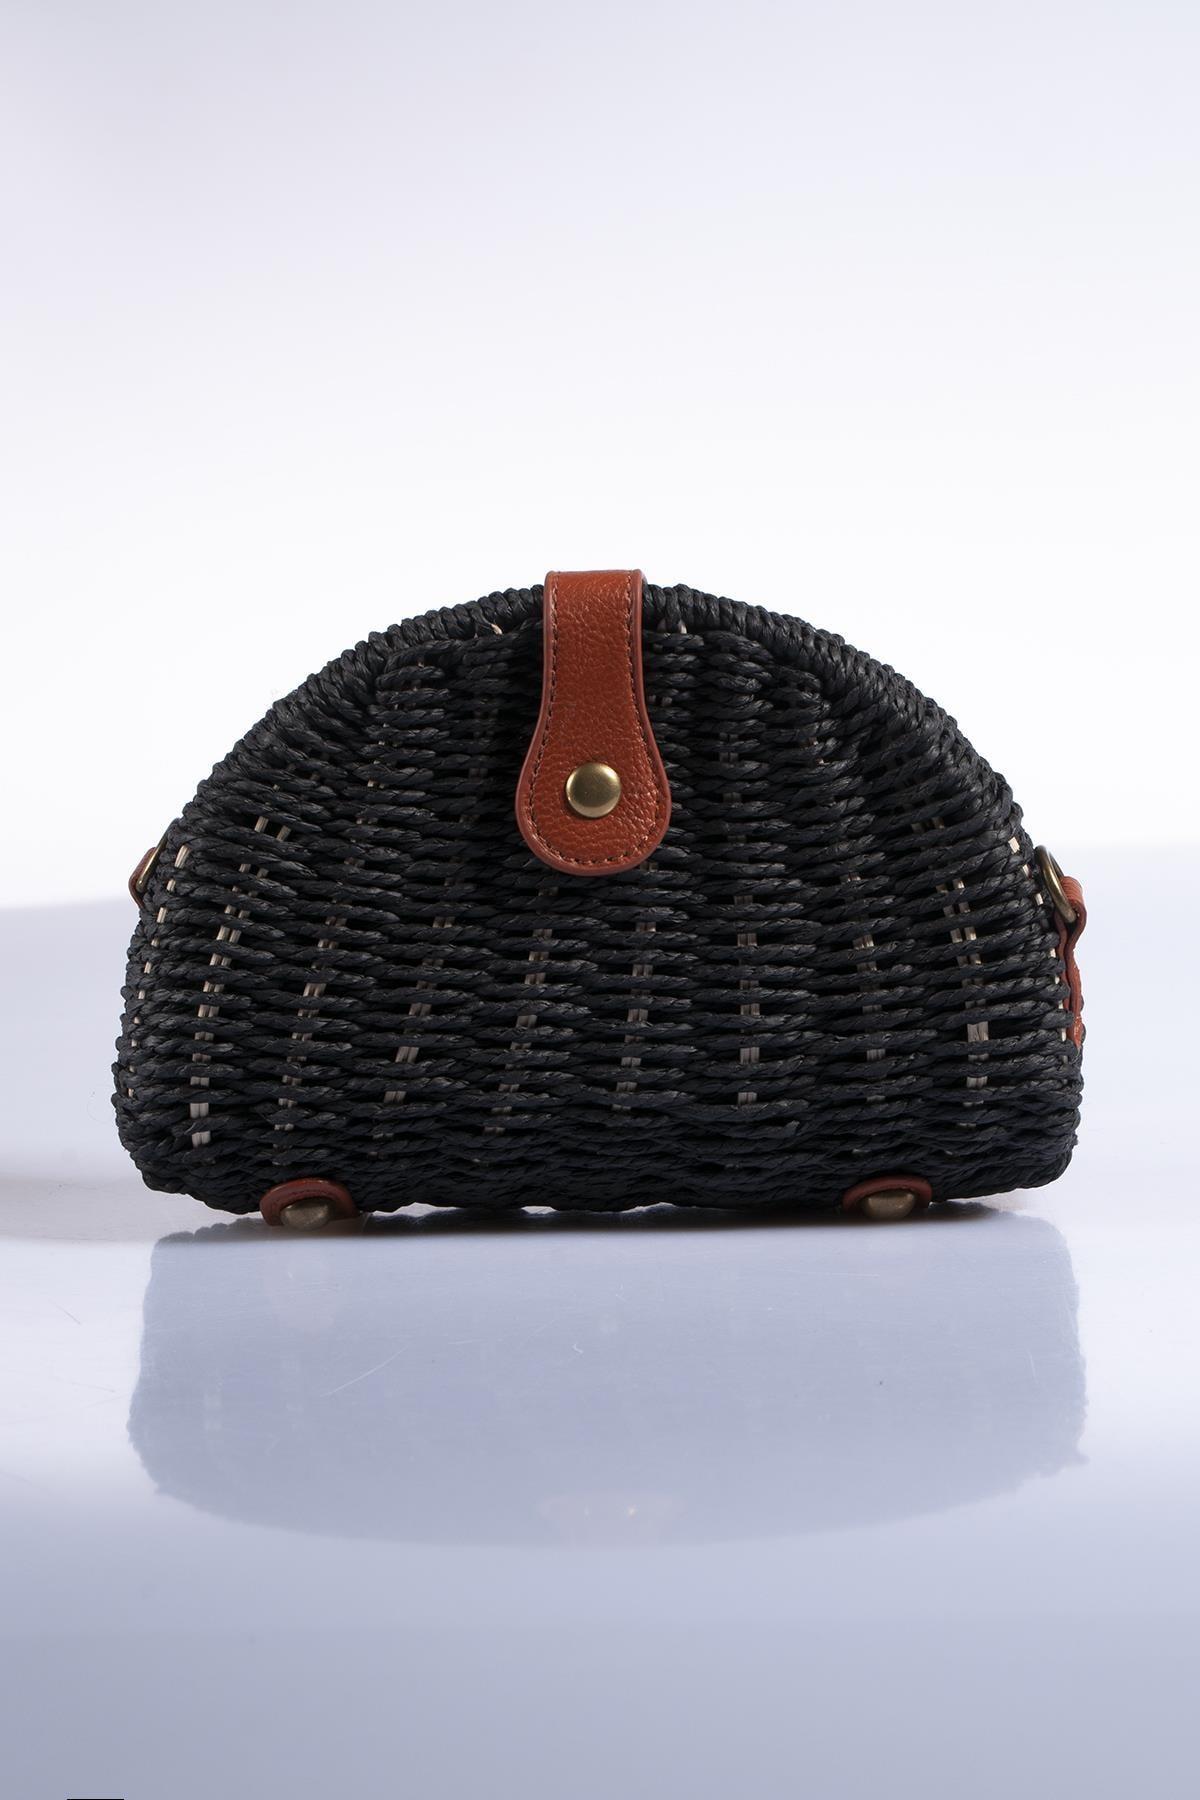 Sergio Giorgianni Kadın Siyah Hasır Omuz Çantası sghsr1008-siyah